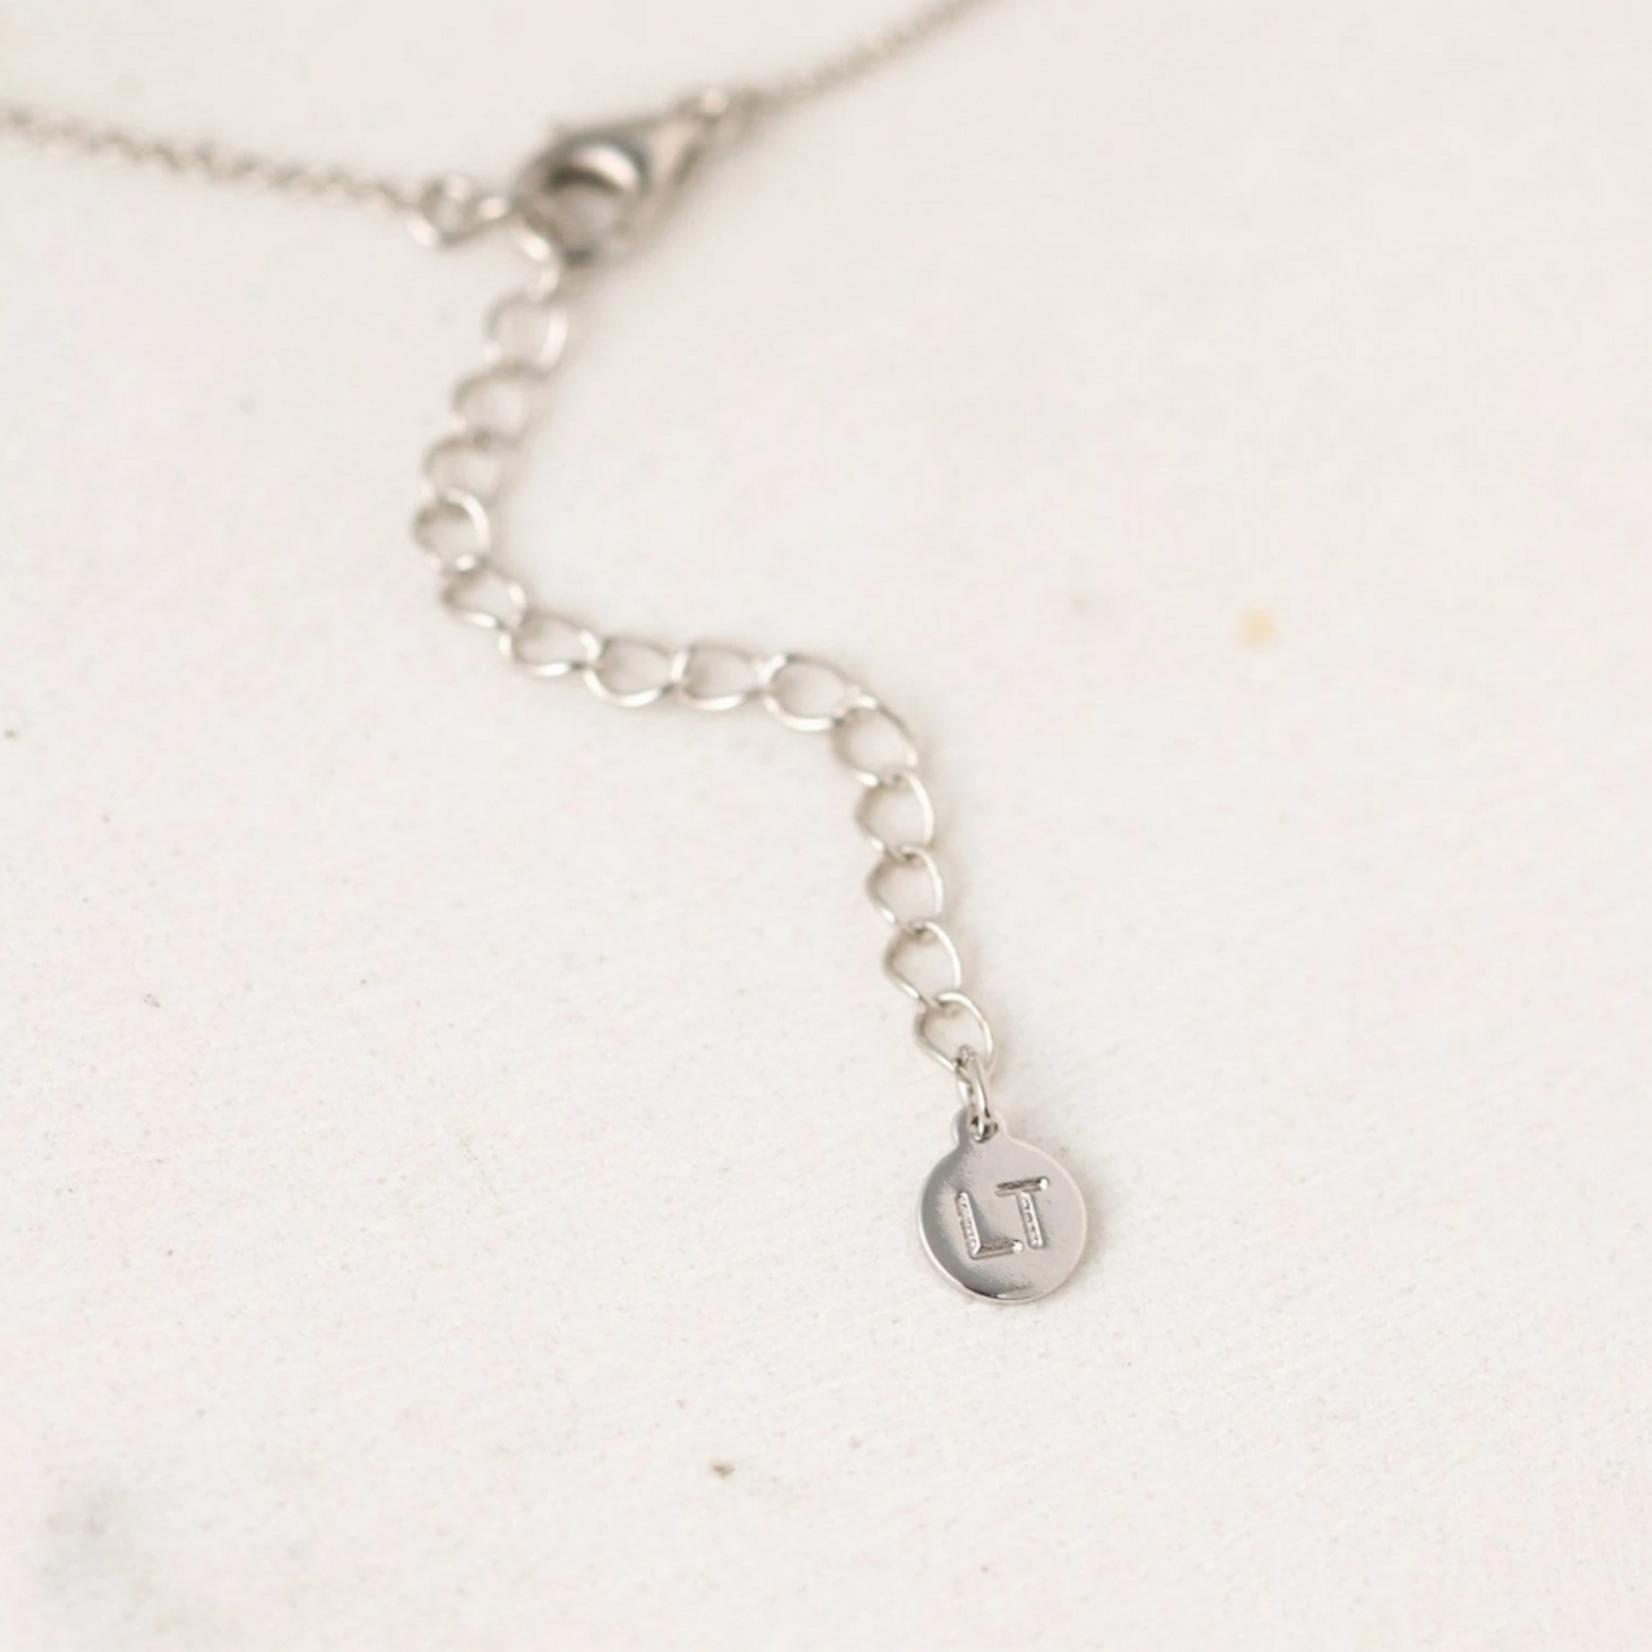 October Kaleidoscope Birthstone Necklace-silver